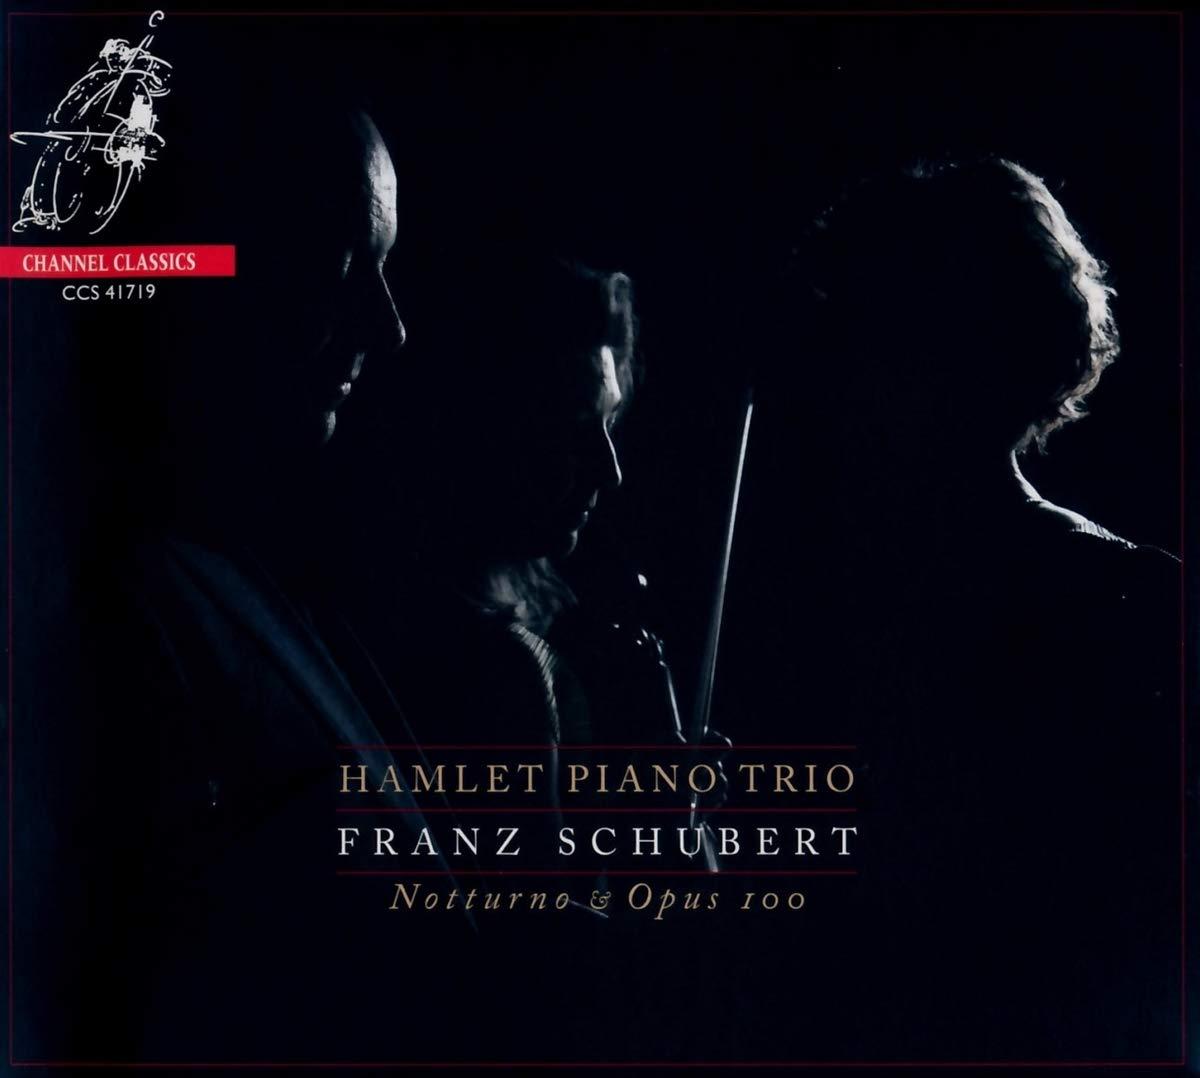 Hamlet Piano Trio – Franz Schubert Notturno & Opus 100